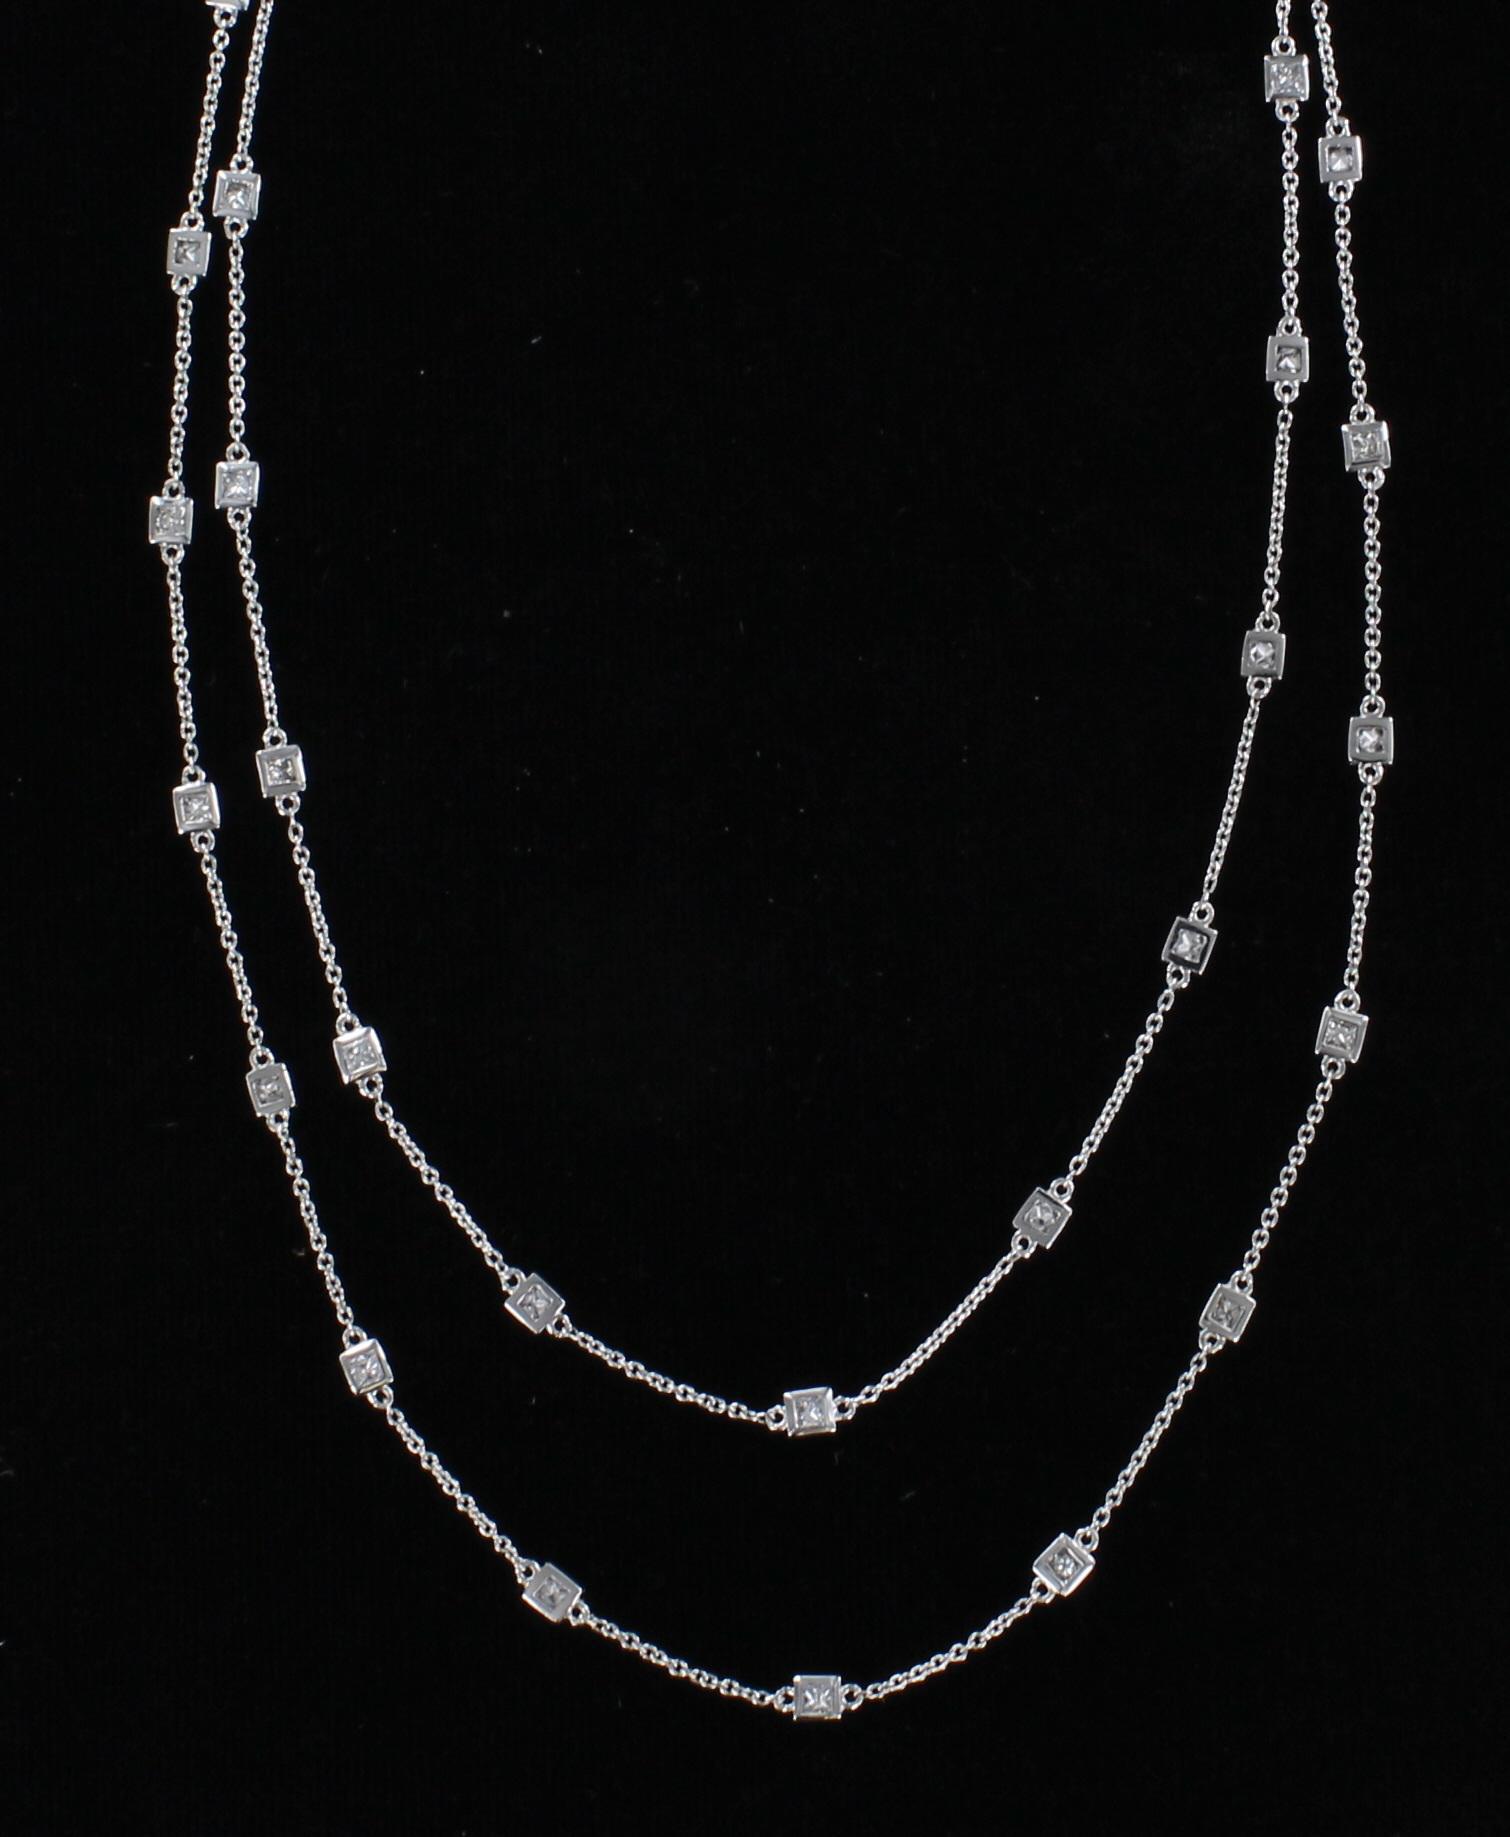 14KTW PRINCESS-CUT DIAMOND CHAIN 101-2878